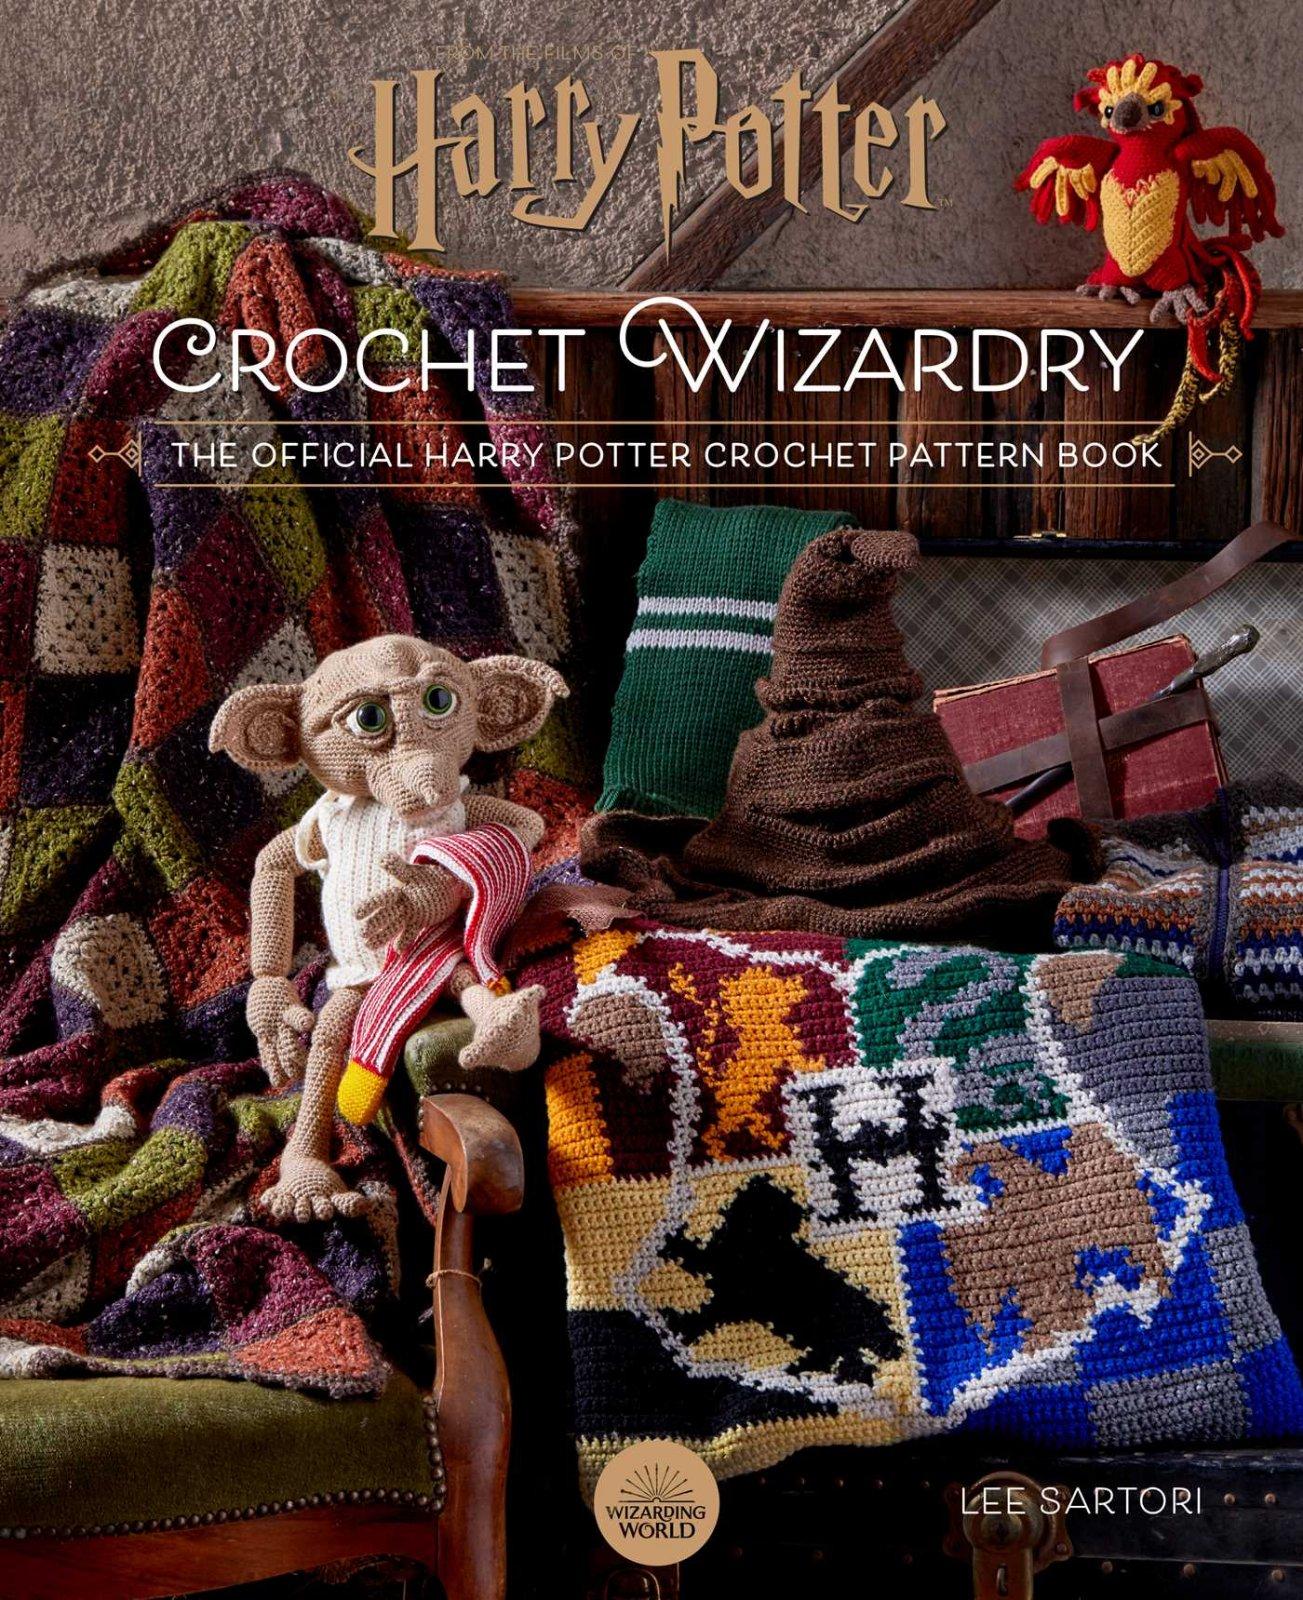 Crochet Wizardry - The Official Harry Potter Crochet Pattern Book